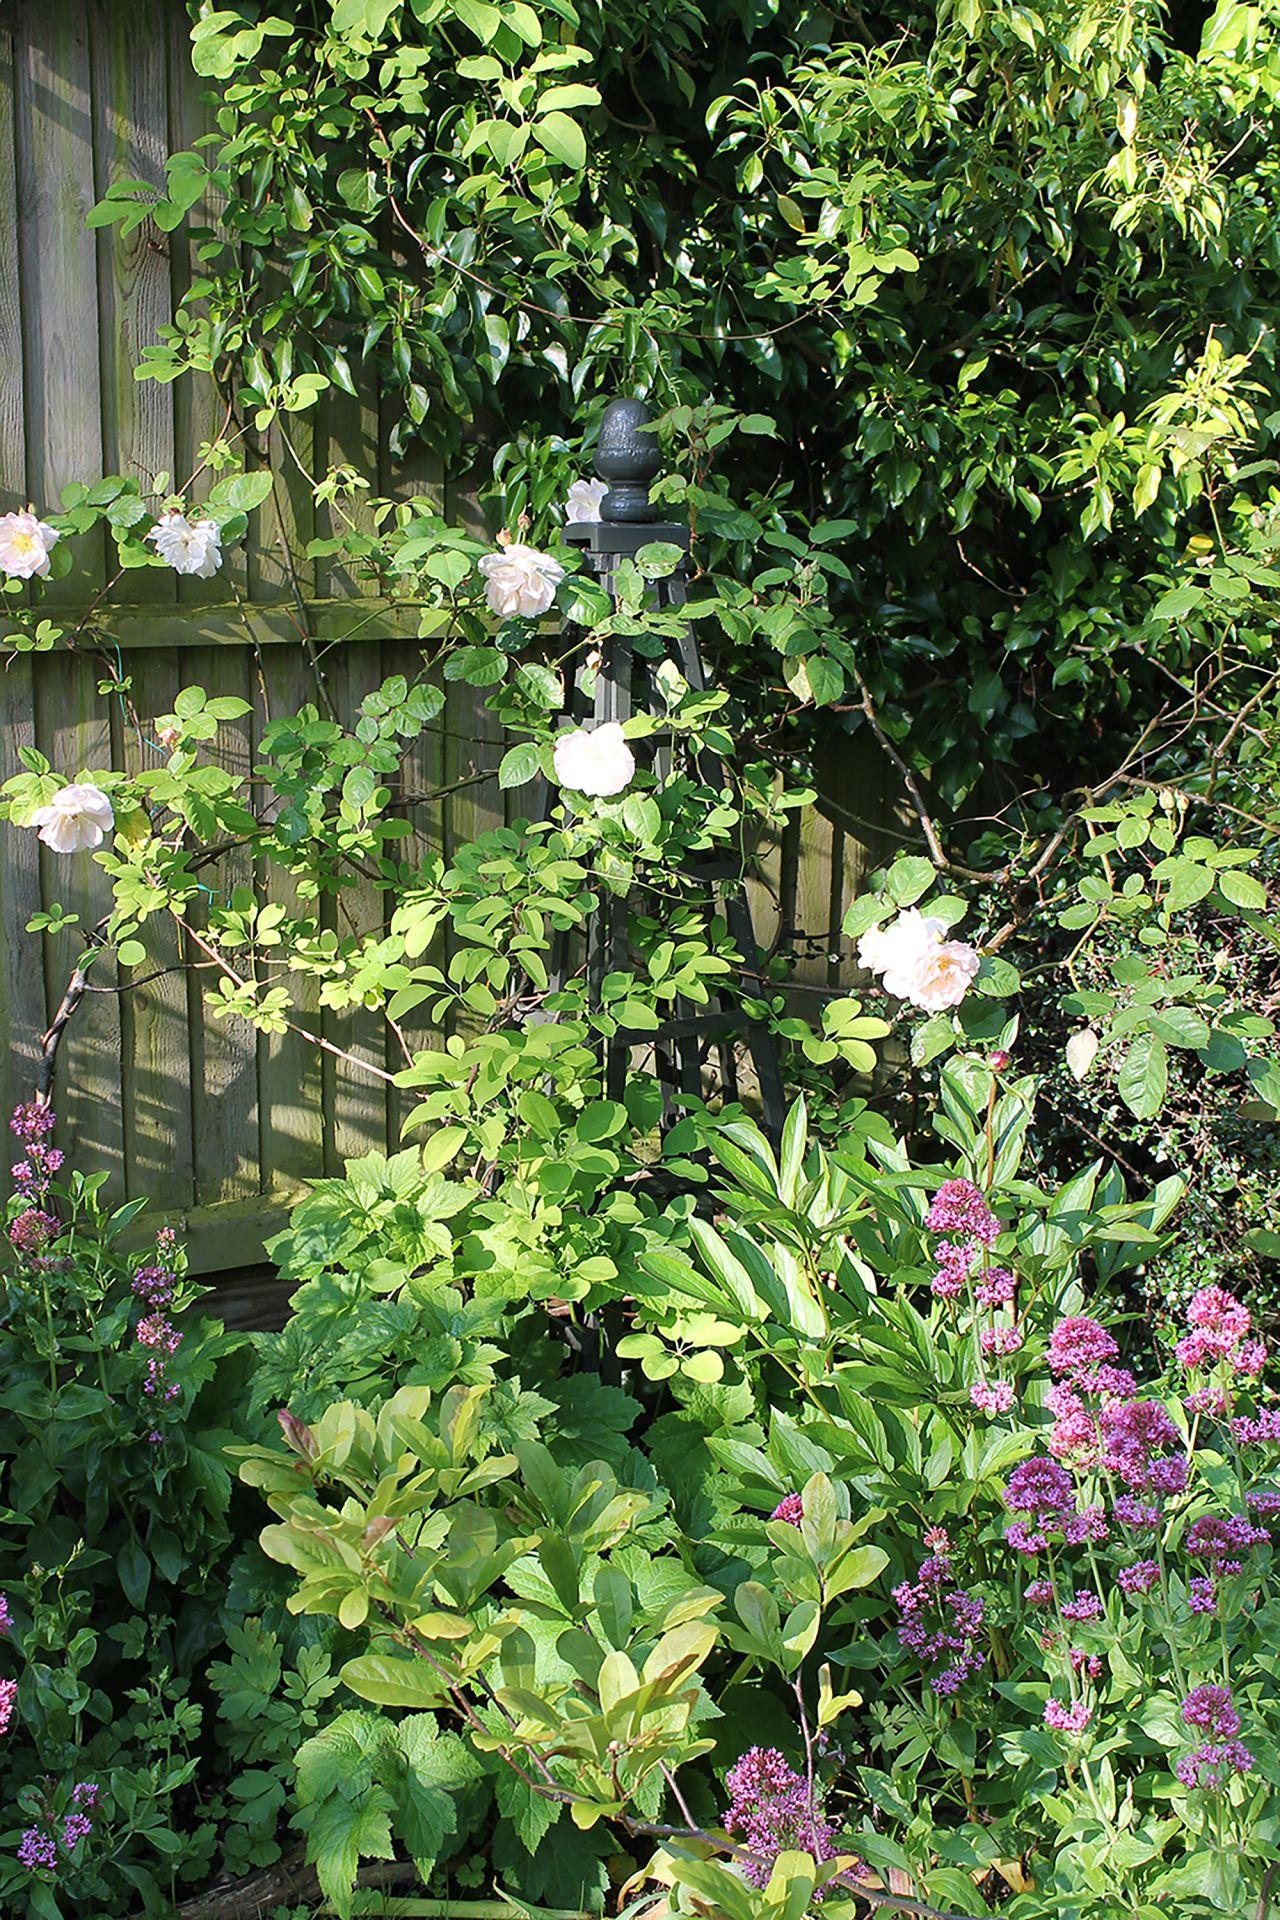 Thorndown-Yew-Green-Wood-Paint-on-garden-obelisk